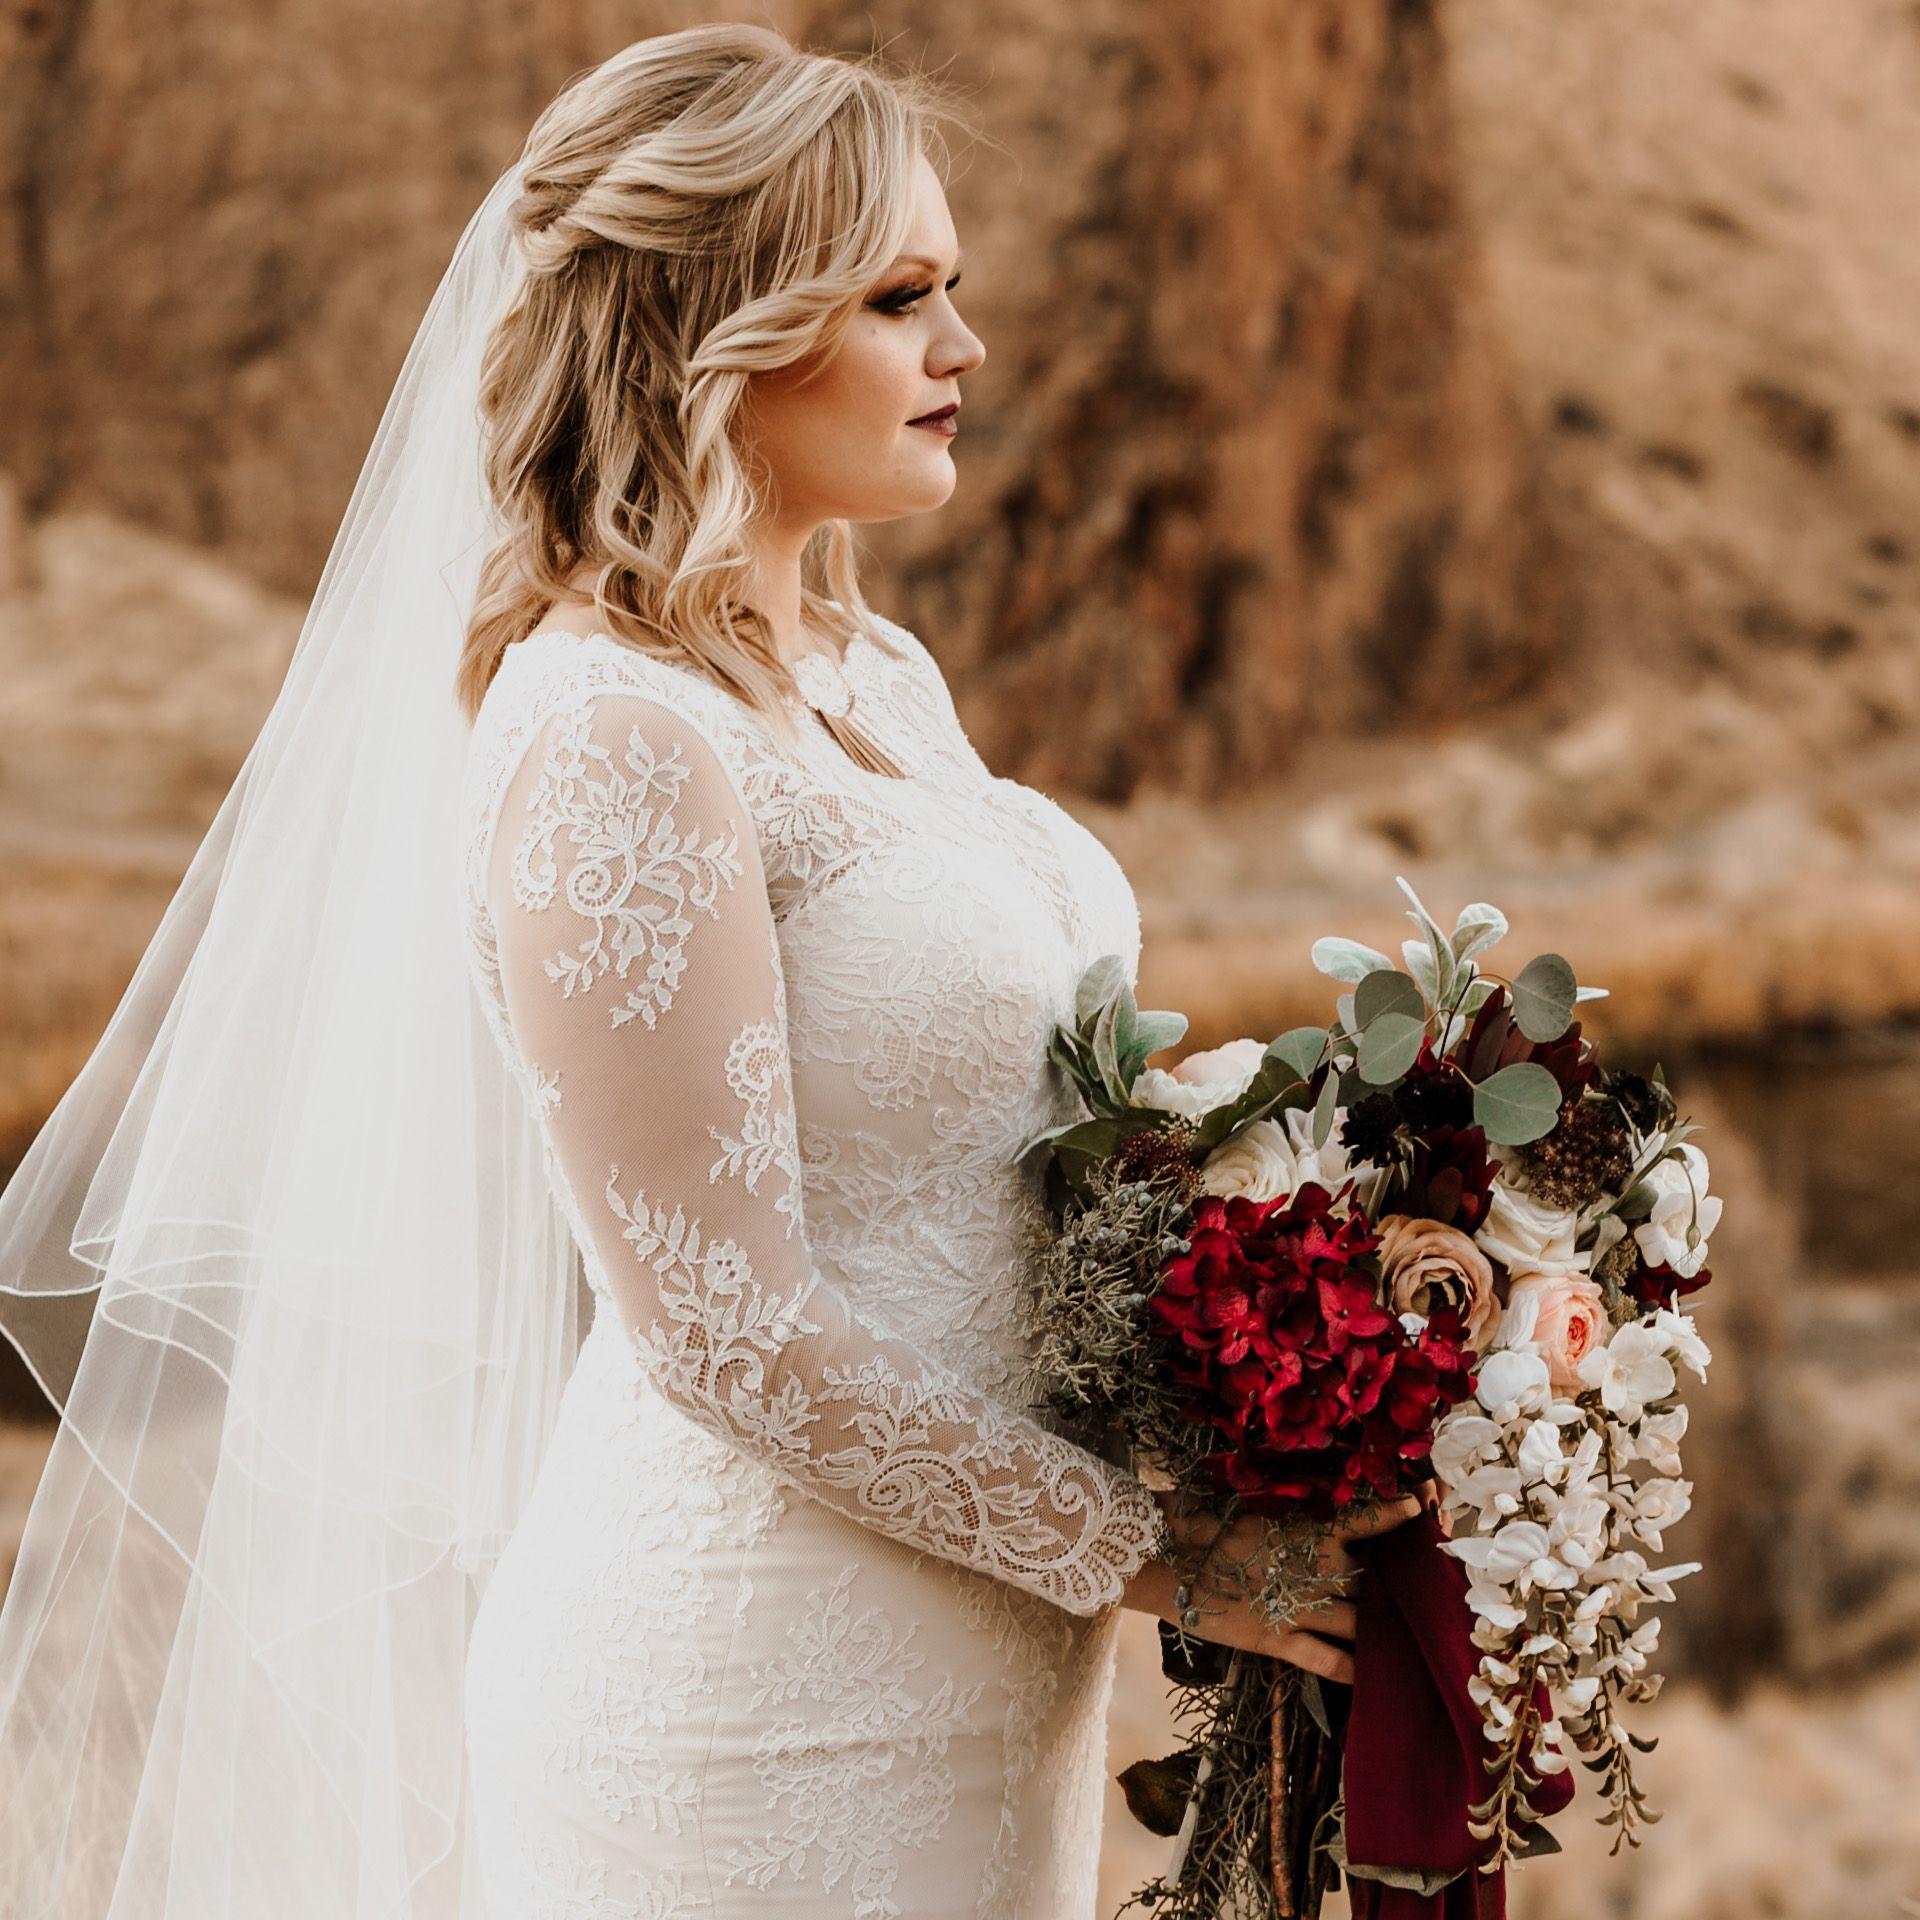 Long Sleeve Lace Wedding Dress Dark Moody Floral Bouquet